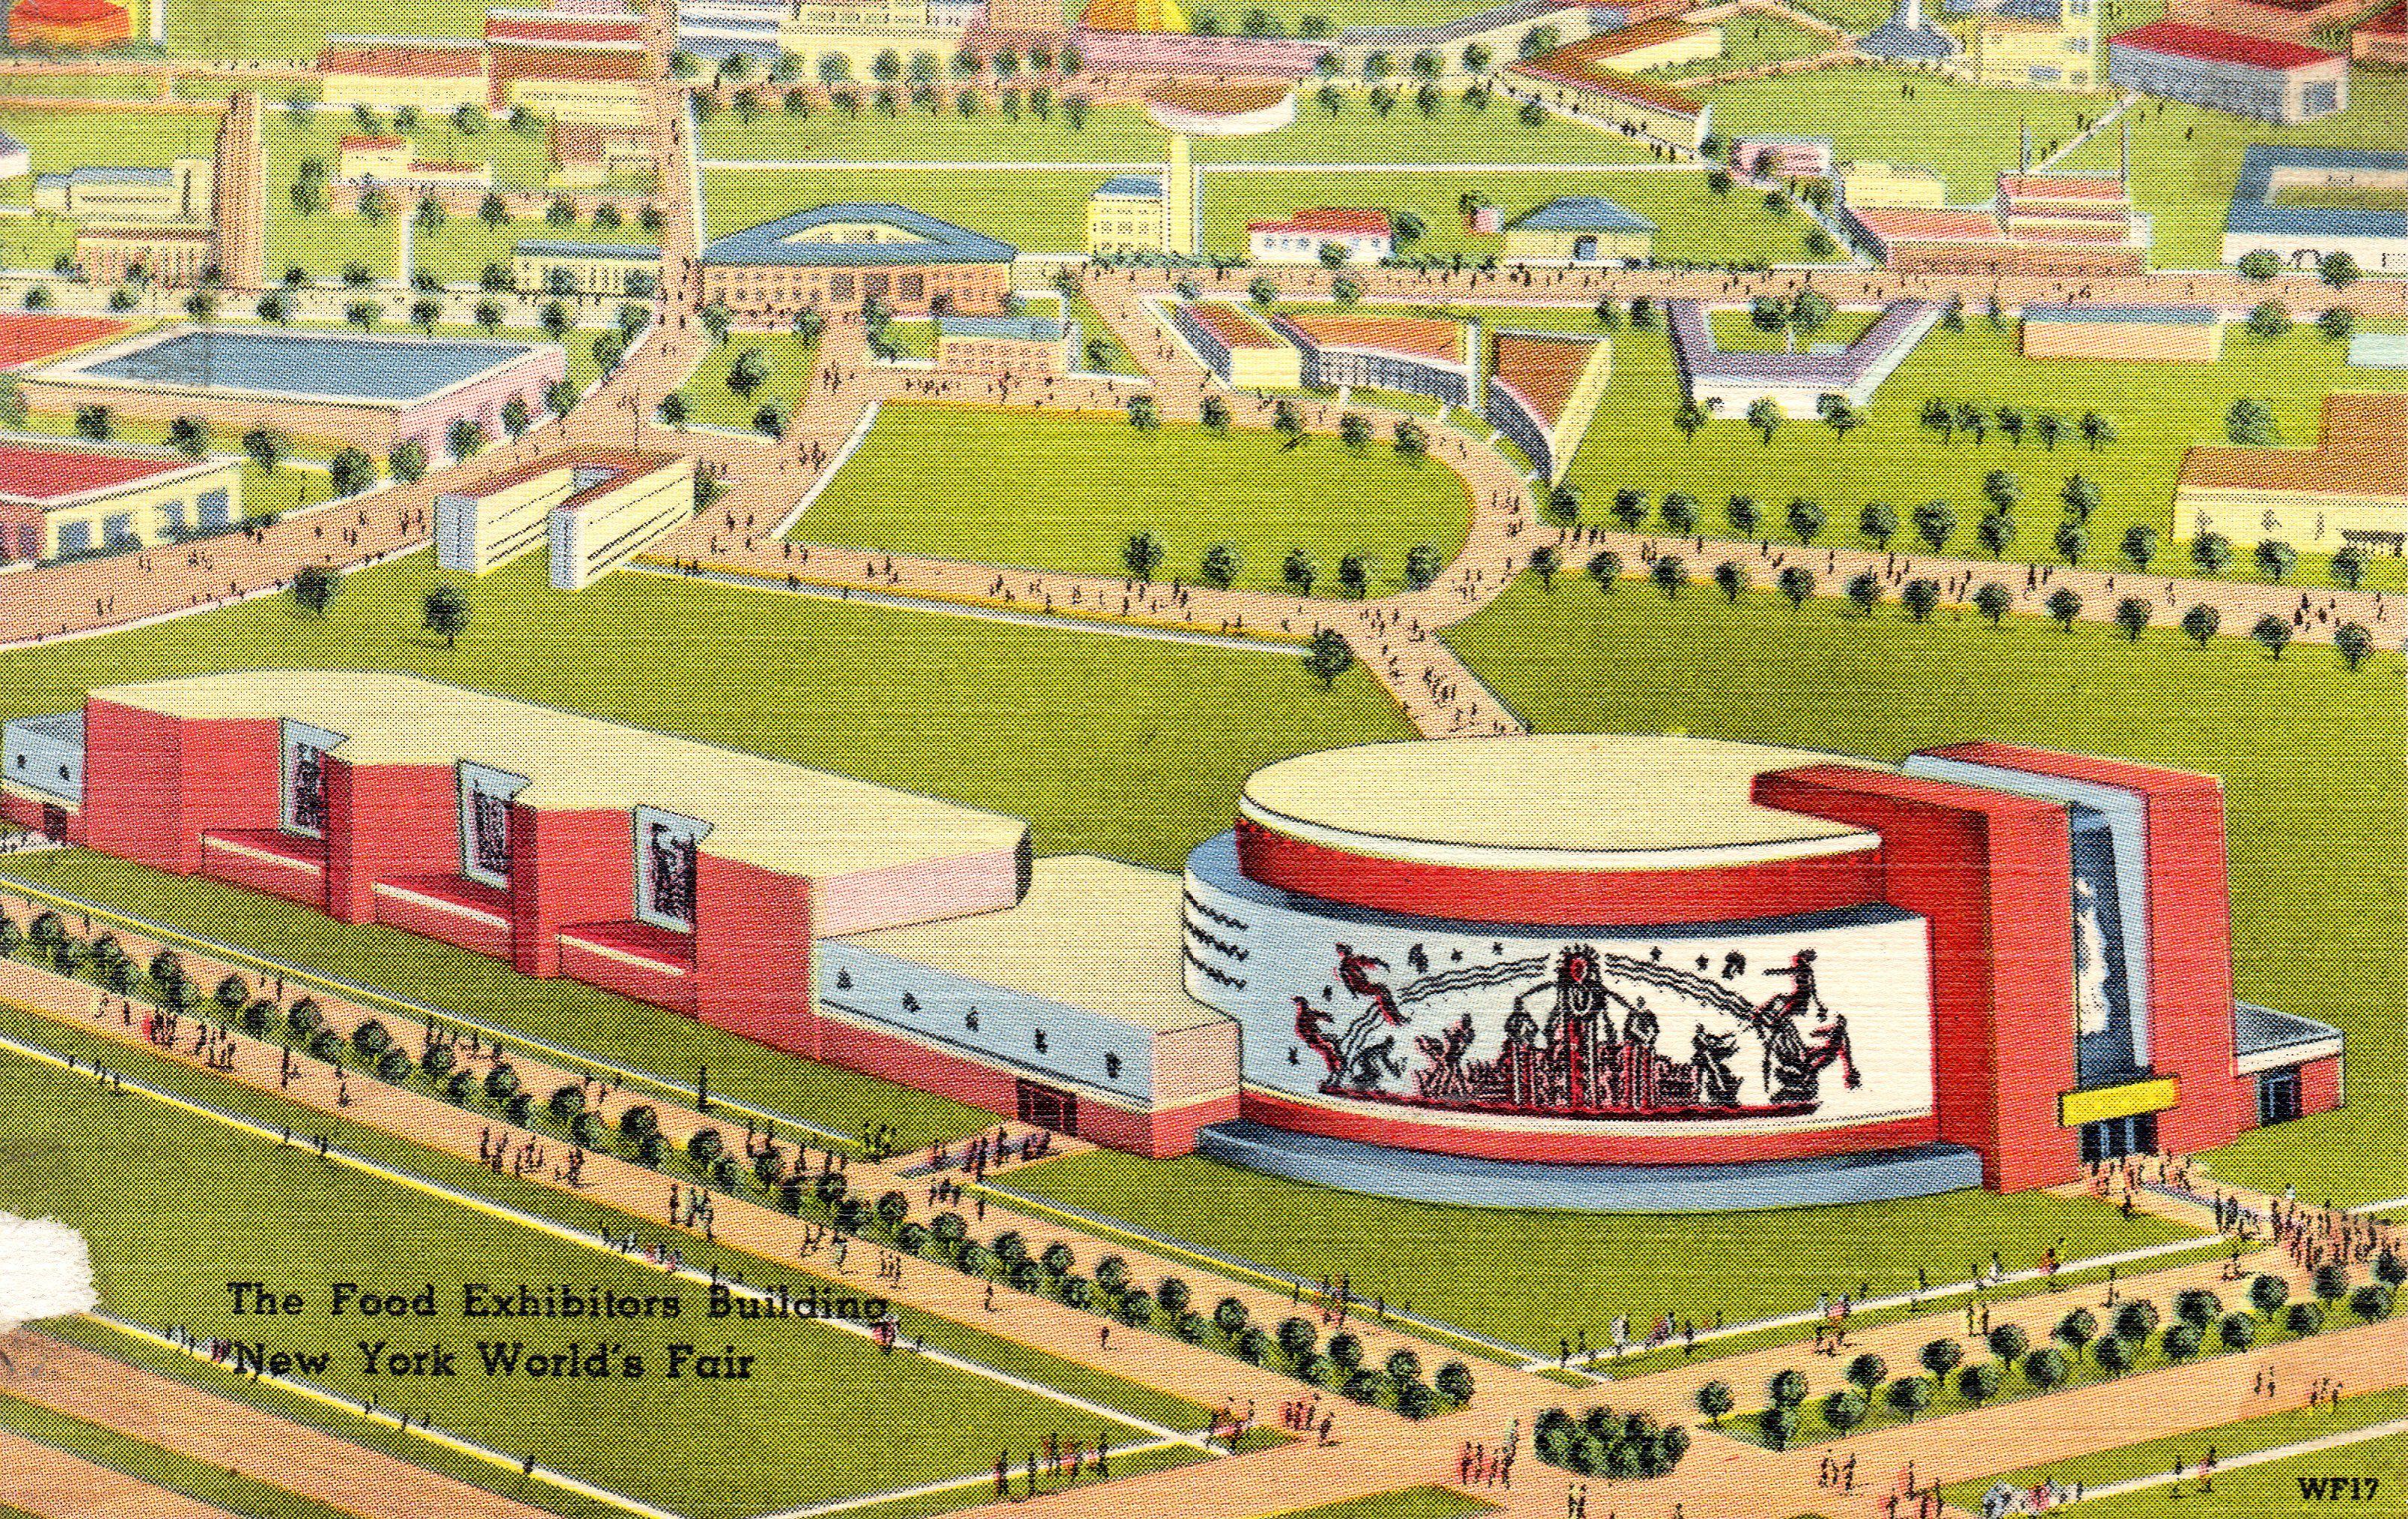 Pin on 1939 World's Fair NYC